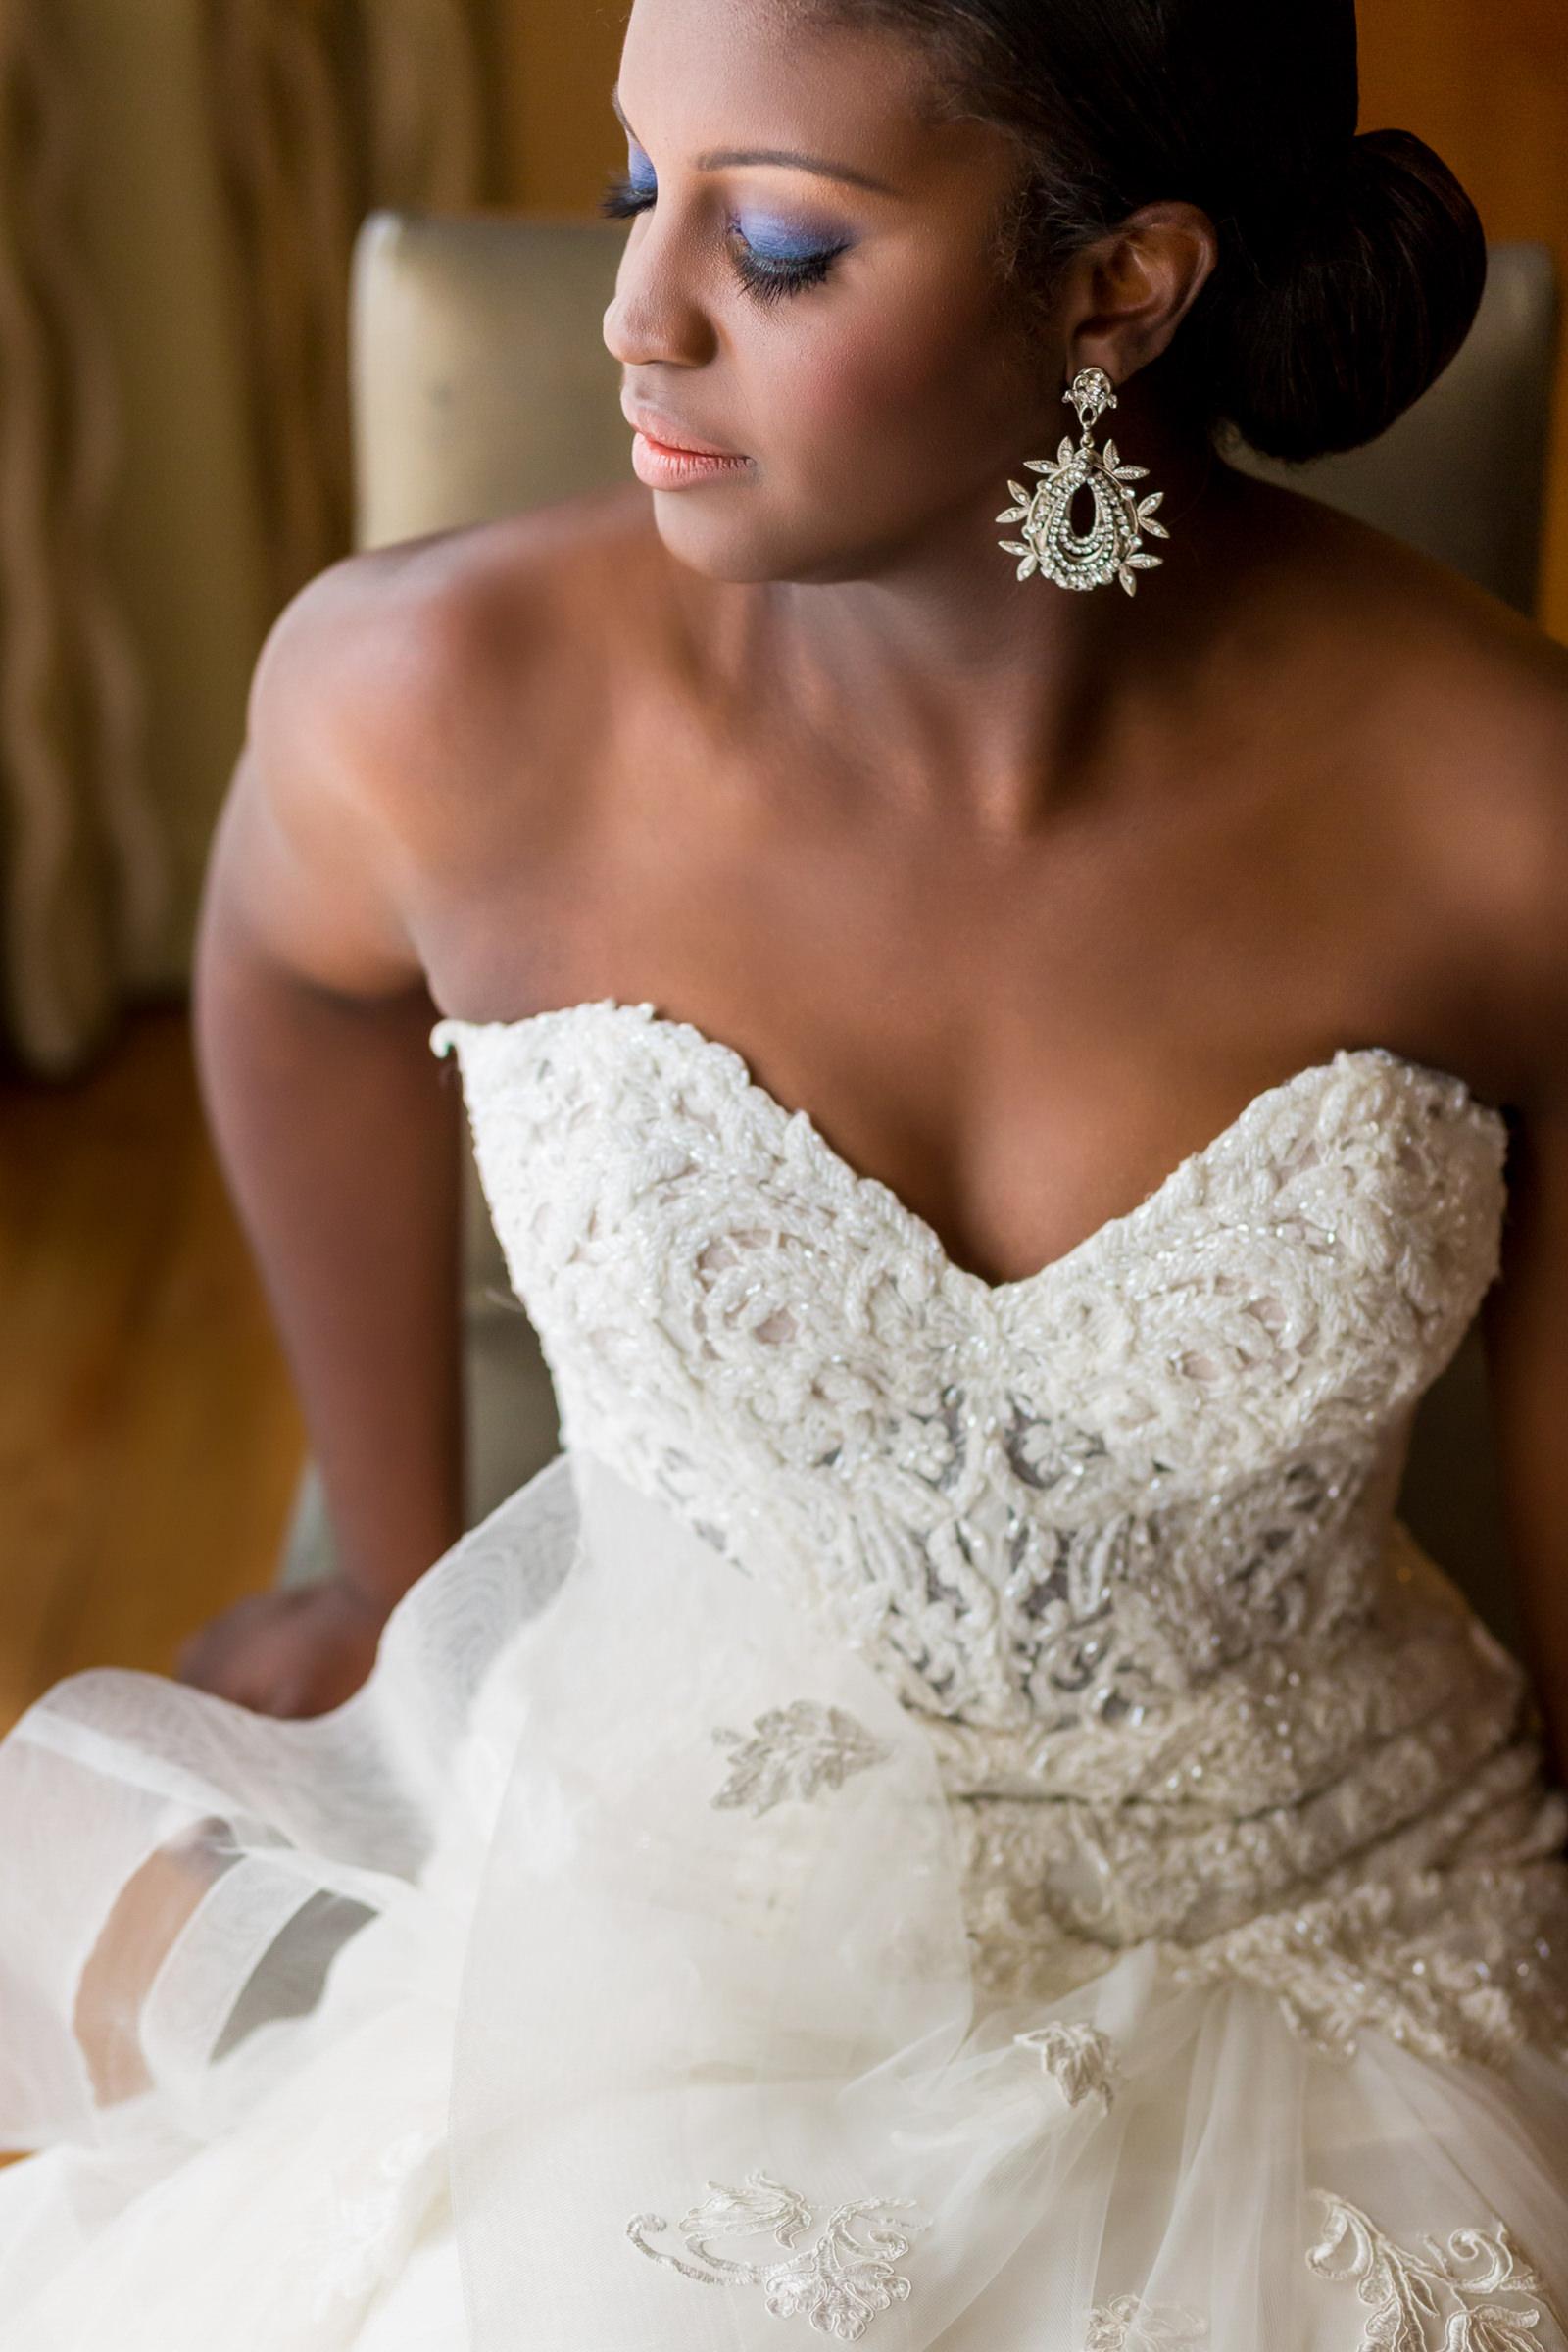 seated-bridal-portrait-procopio-photography